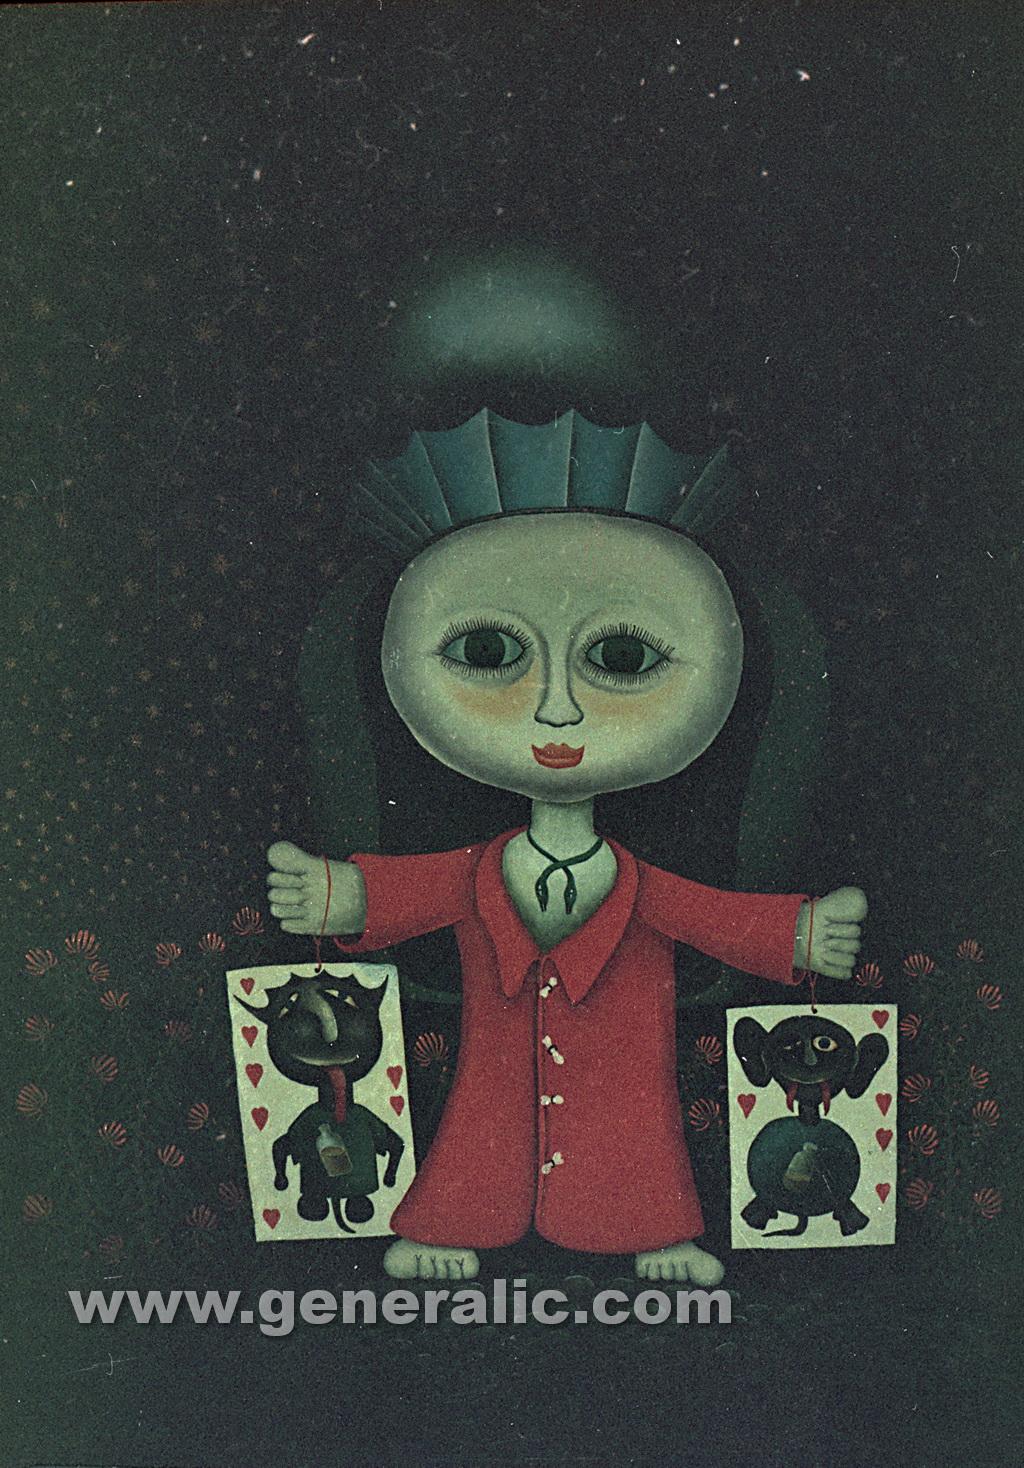 Josip Generalic, 1988, A puppet, oil on glass